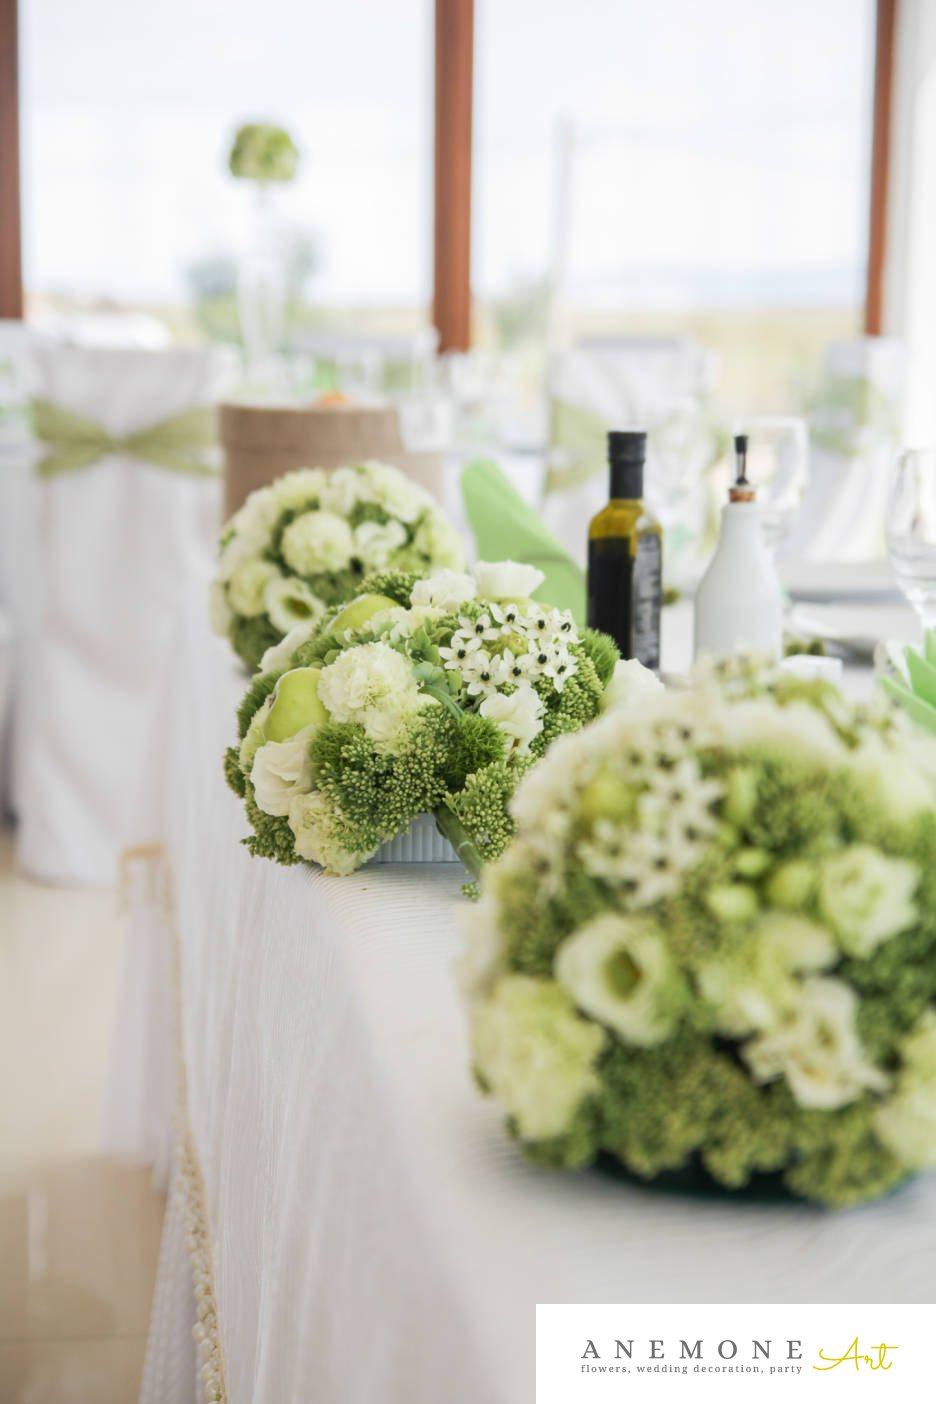 Poza, foto cu Flori de nunta alb, decor masa, garoafe, lisianthus, mere verzi, ornitogallum, sebum, trandafiri, verde in Arad, Timisoara, Oradea (wedding flowers, bouquets) nunta Arad, Timisoara, Oradea